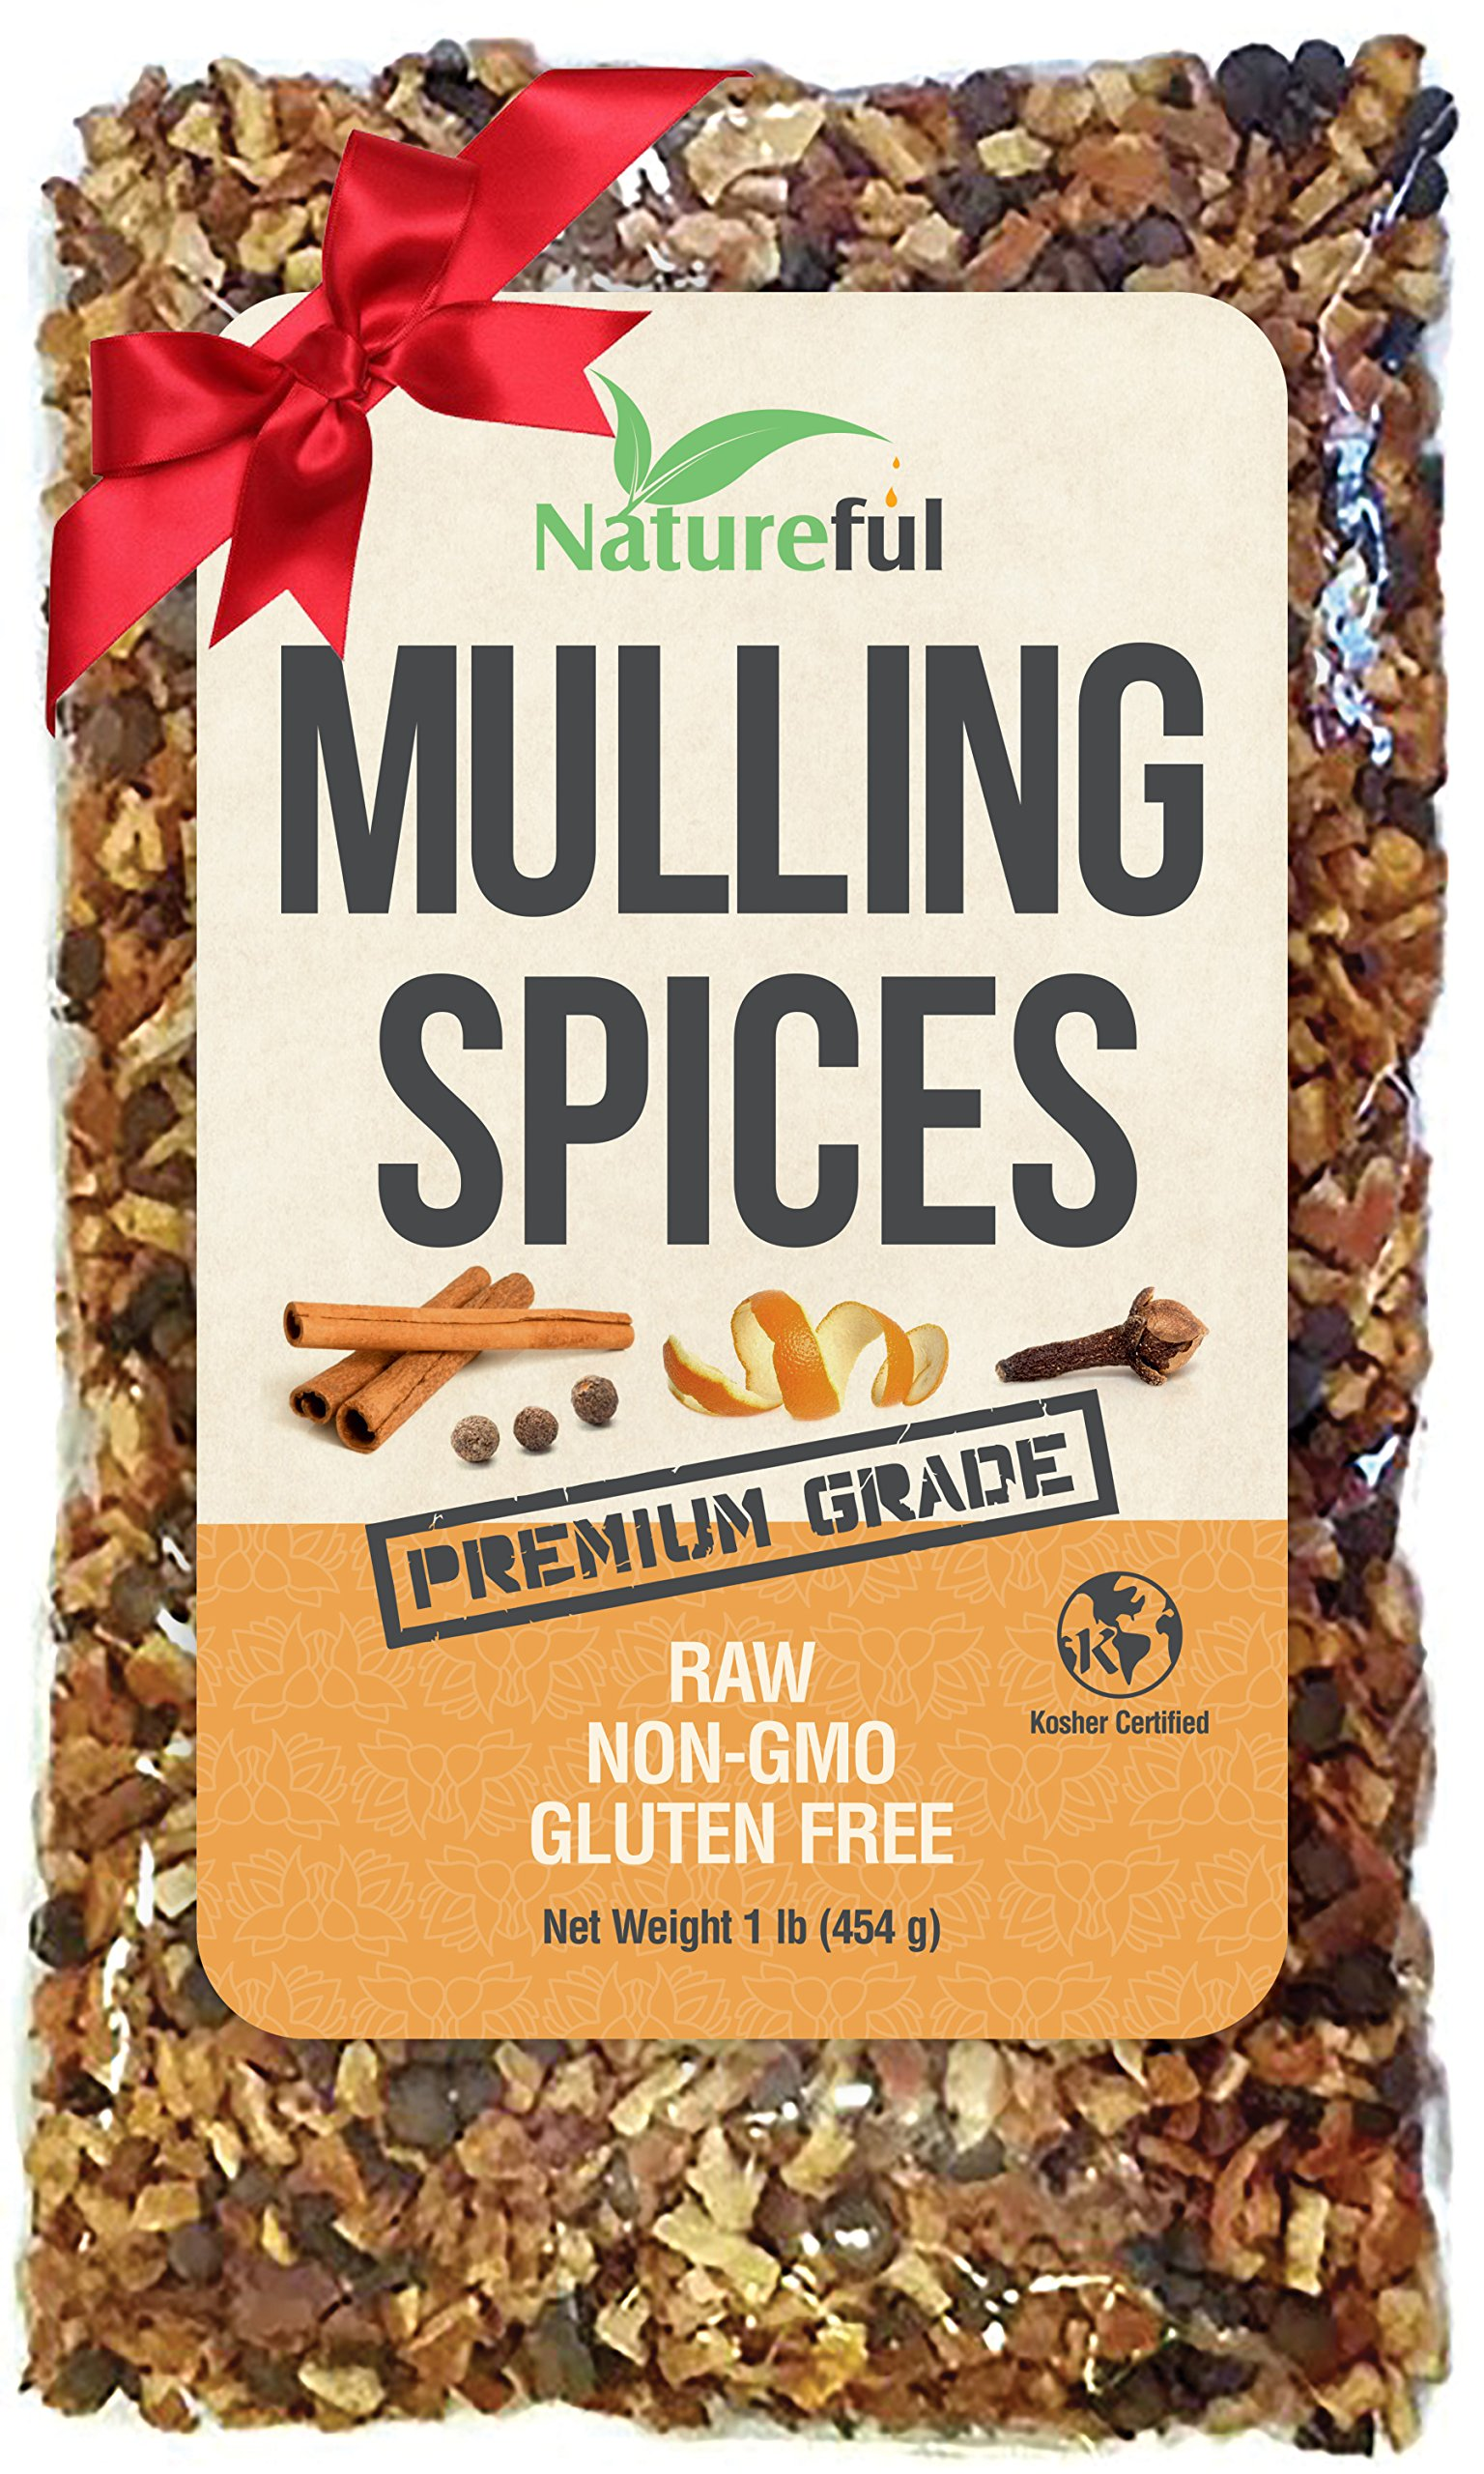 Mulling Spices for Mulled Wine Apple Cider Teas Kit: Holiday Special! Original 1 Pound Bulk Bag - Mix of Orange Peel, All Spice, Cinnamon Sticks Blend